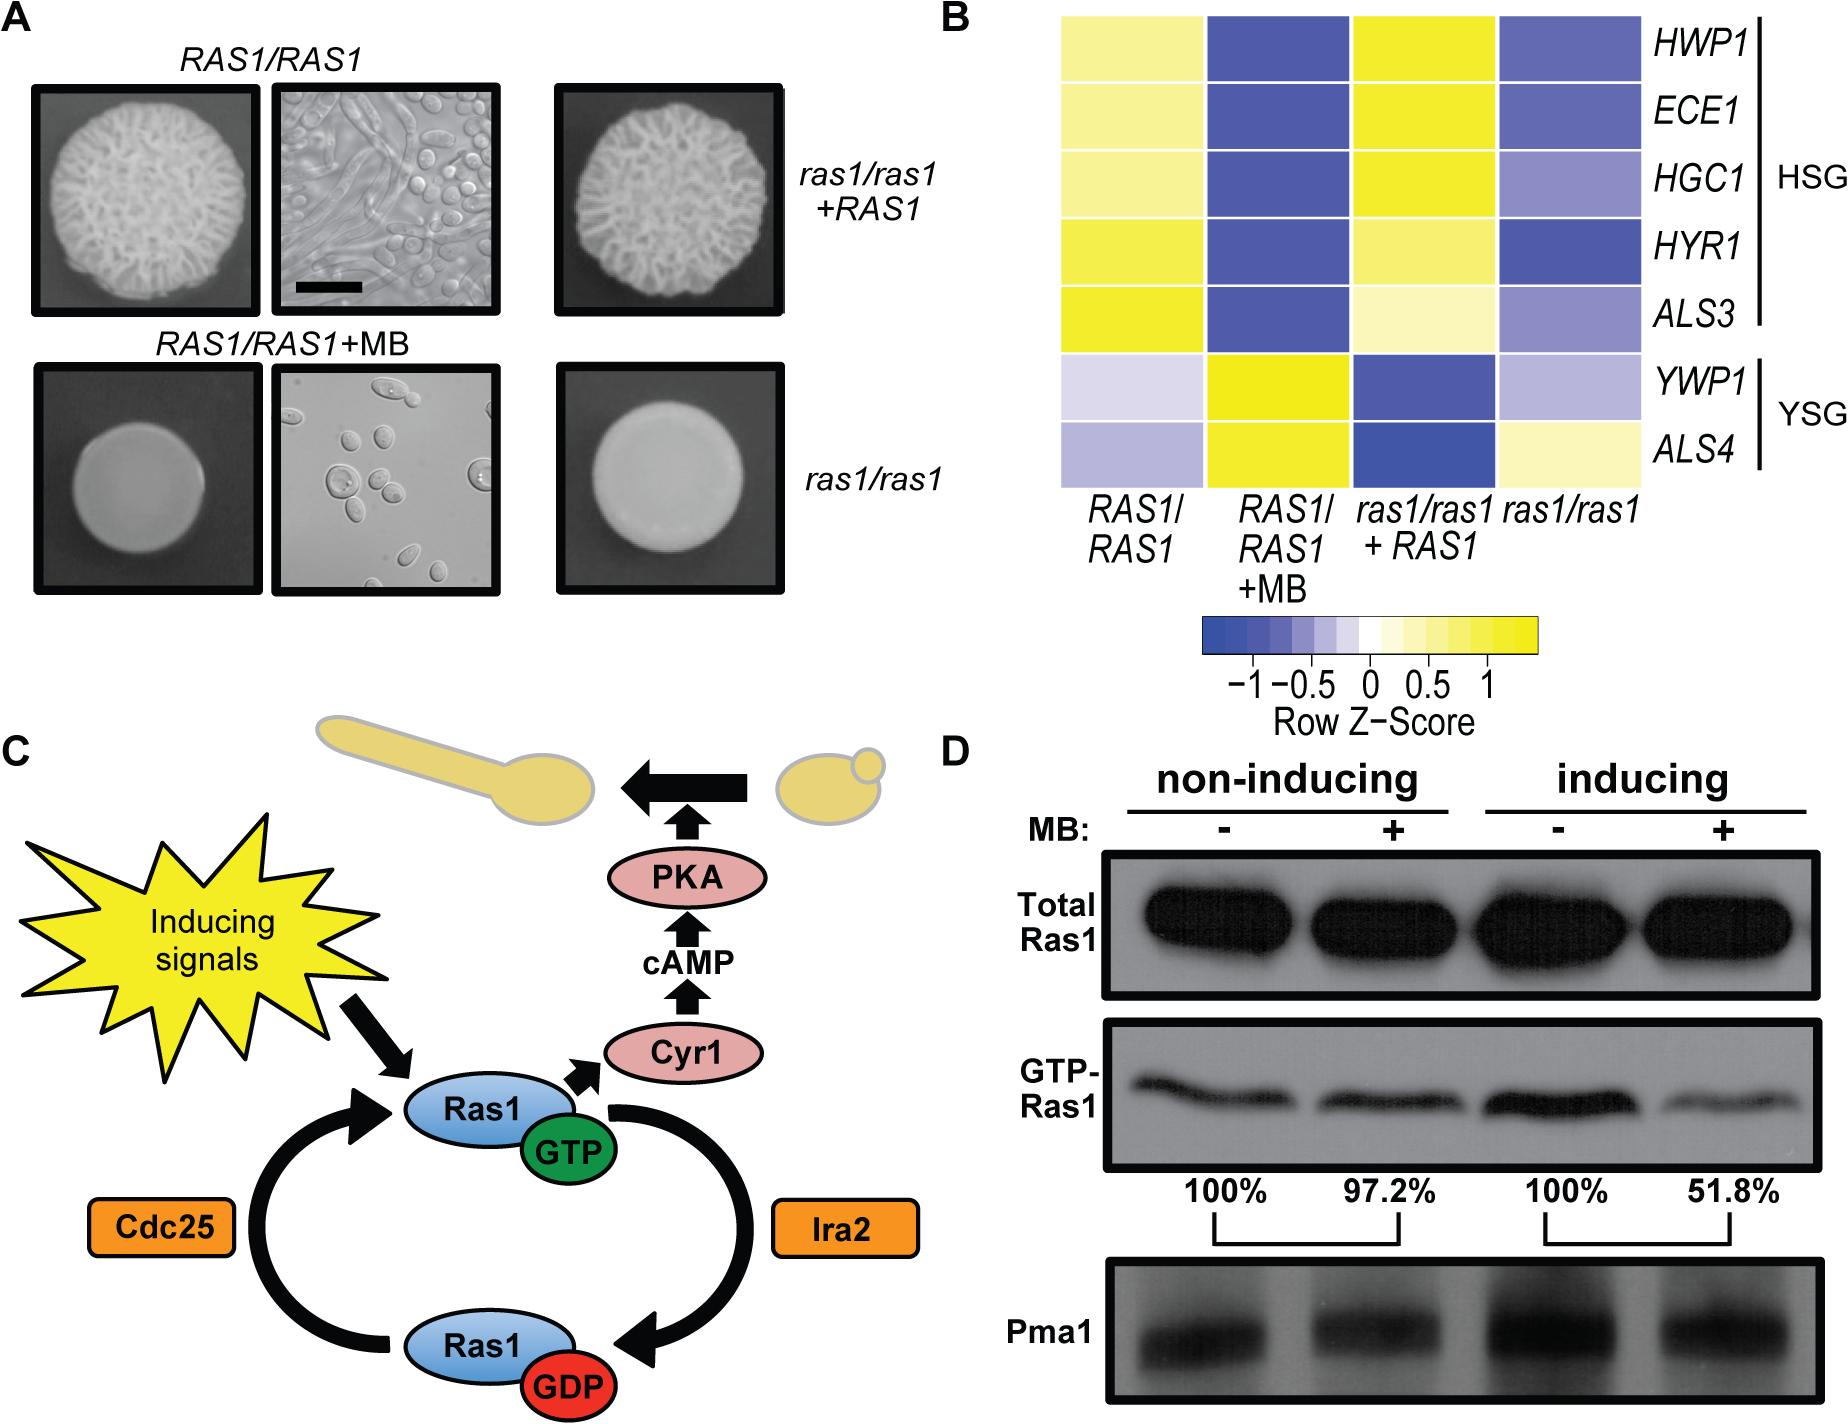 MB inhibits Ras1 activity and Ras1-dependent filamentation.